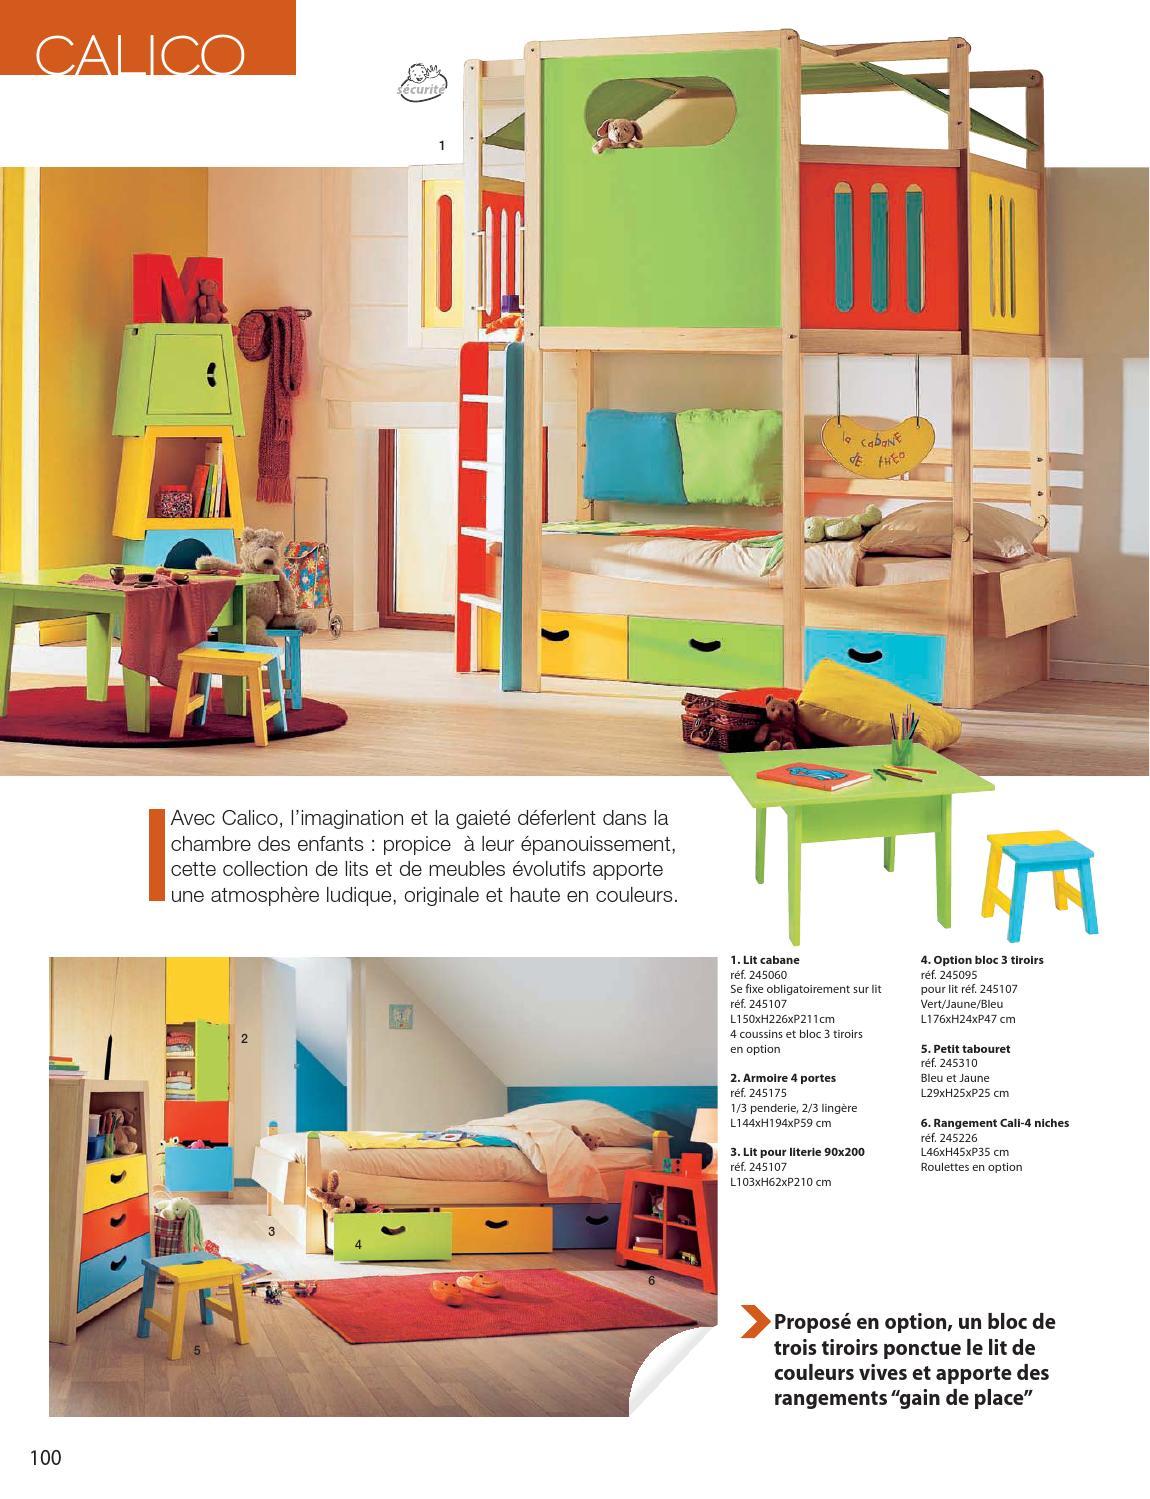 Catalogue Gautier - Collection 2012/2013 by joe monroe - issuu